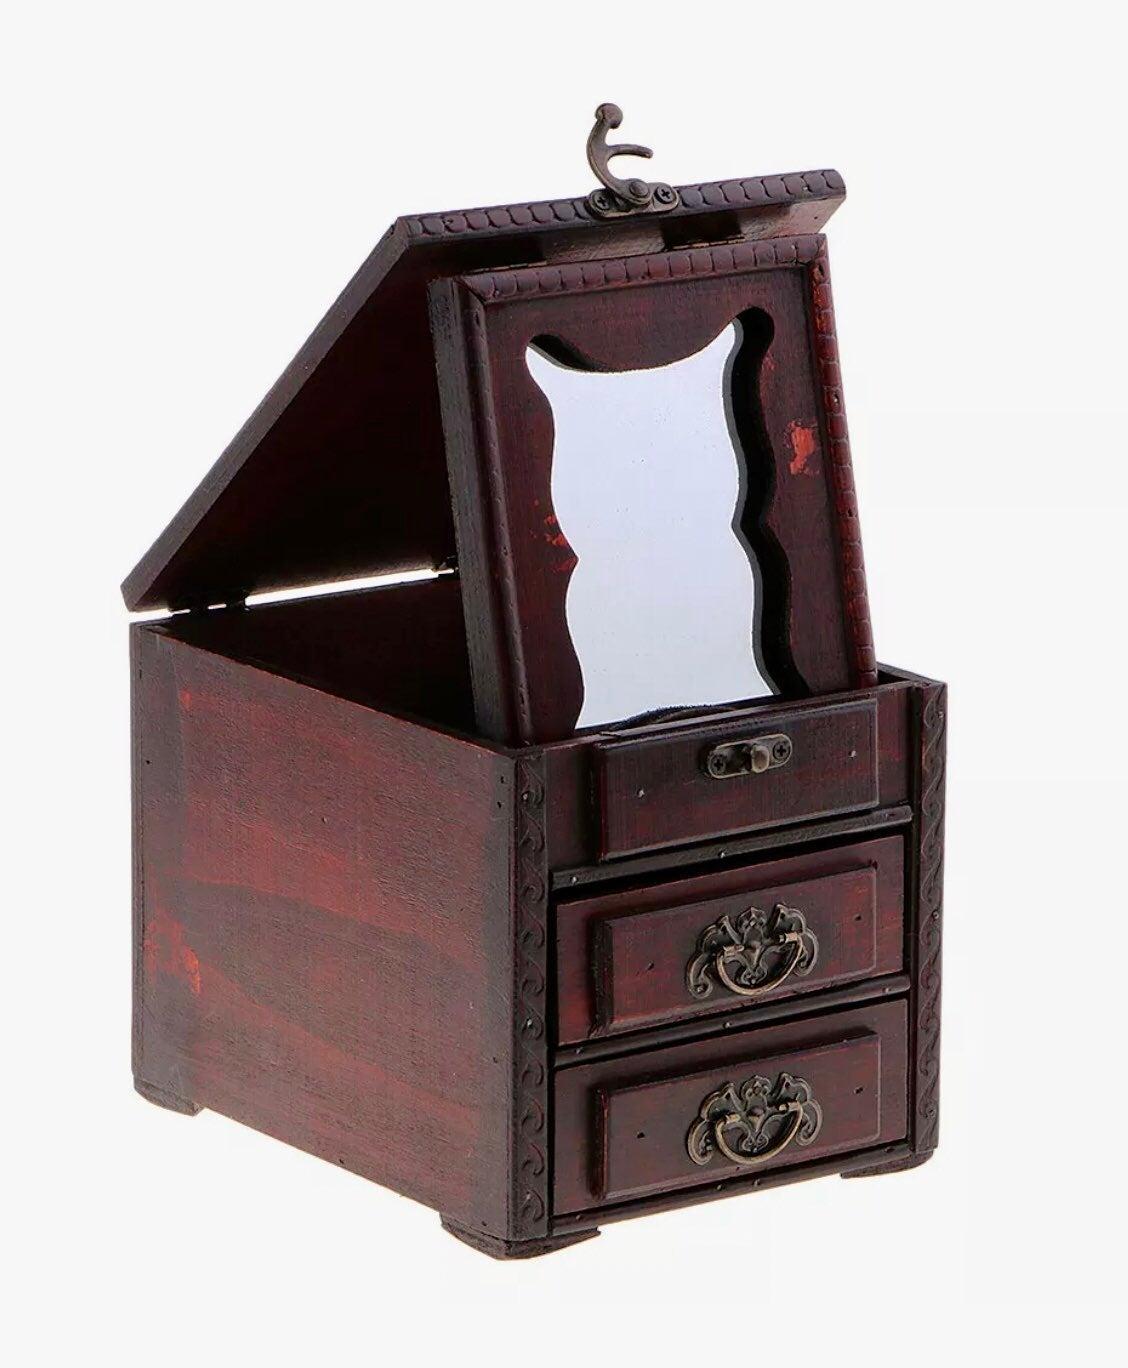 Secret jewelry box